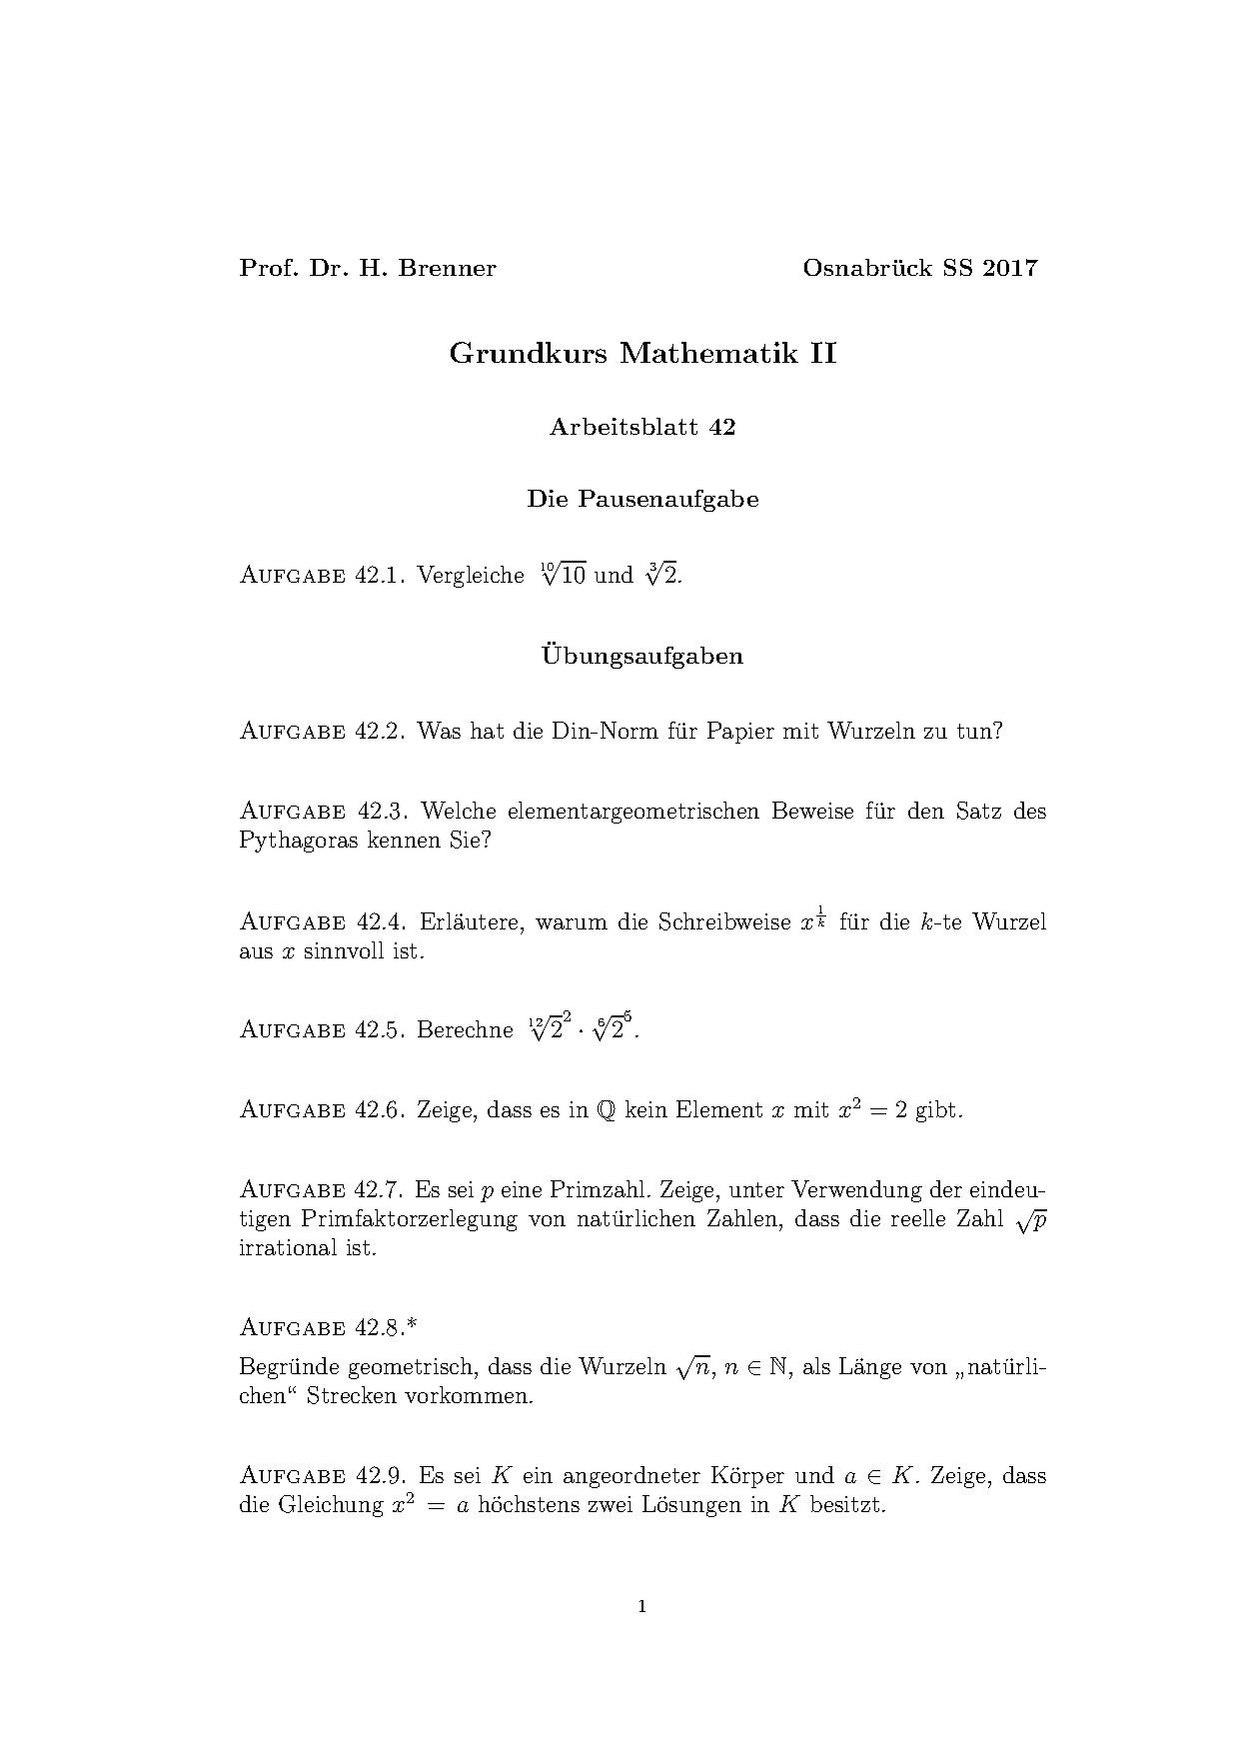 File:Grundkurs Mathematik (Osnabrück 2016-2017)Teil IIArbeitsblatt42 ...